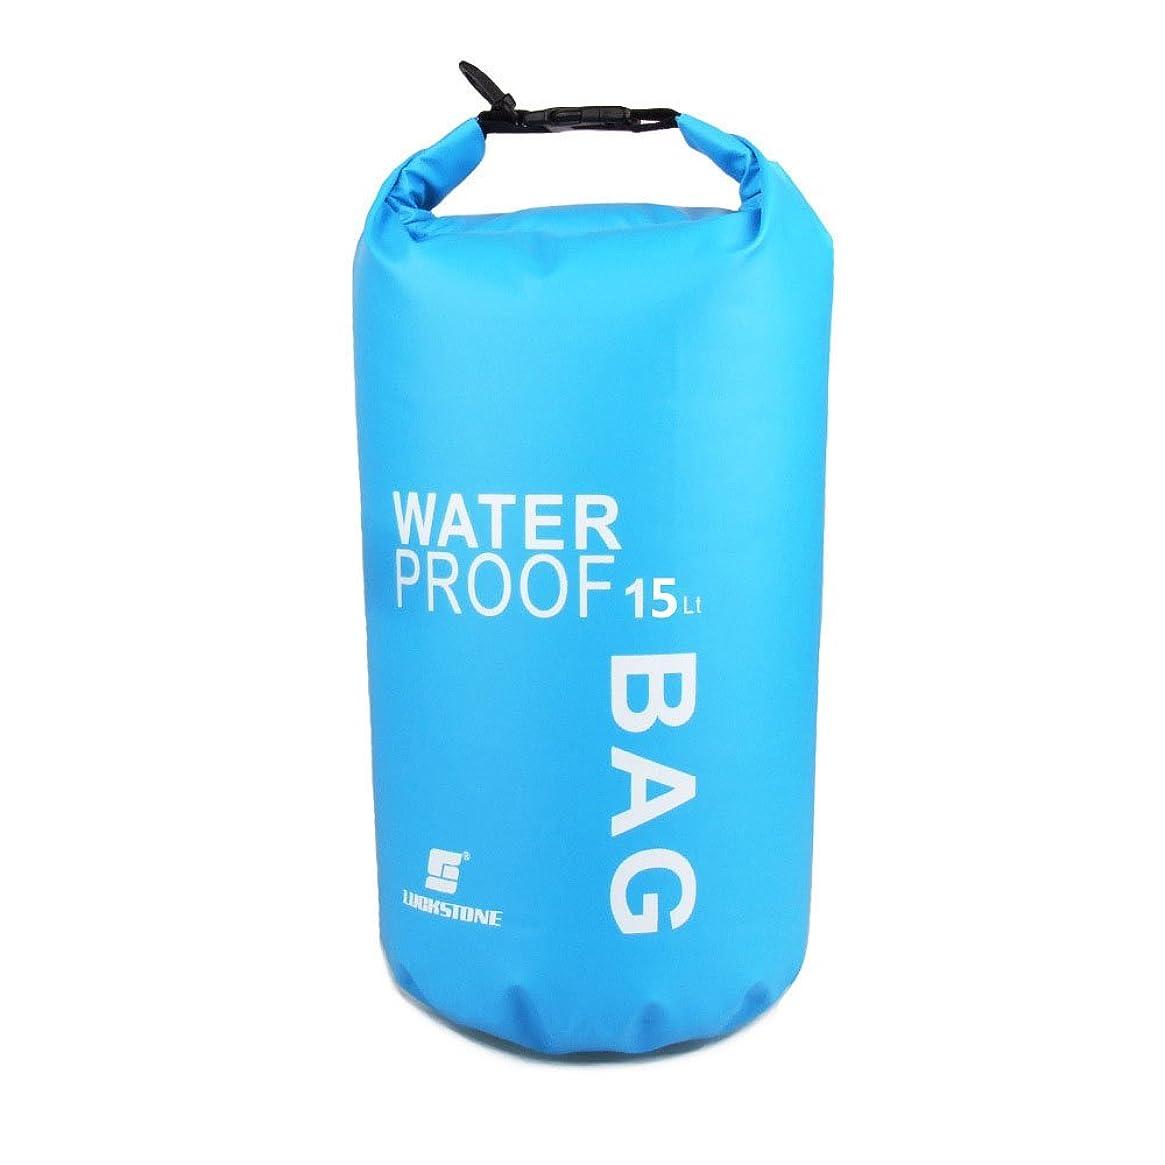 Drifting Waterproof Dry Bag for Boating, Kayaking, Fishing, Rafting, Swimming, Camping, Canoeing Colorful